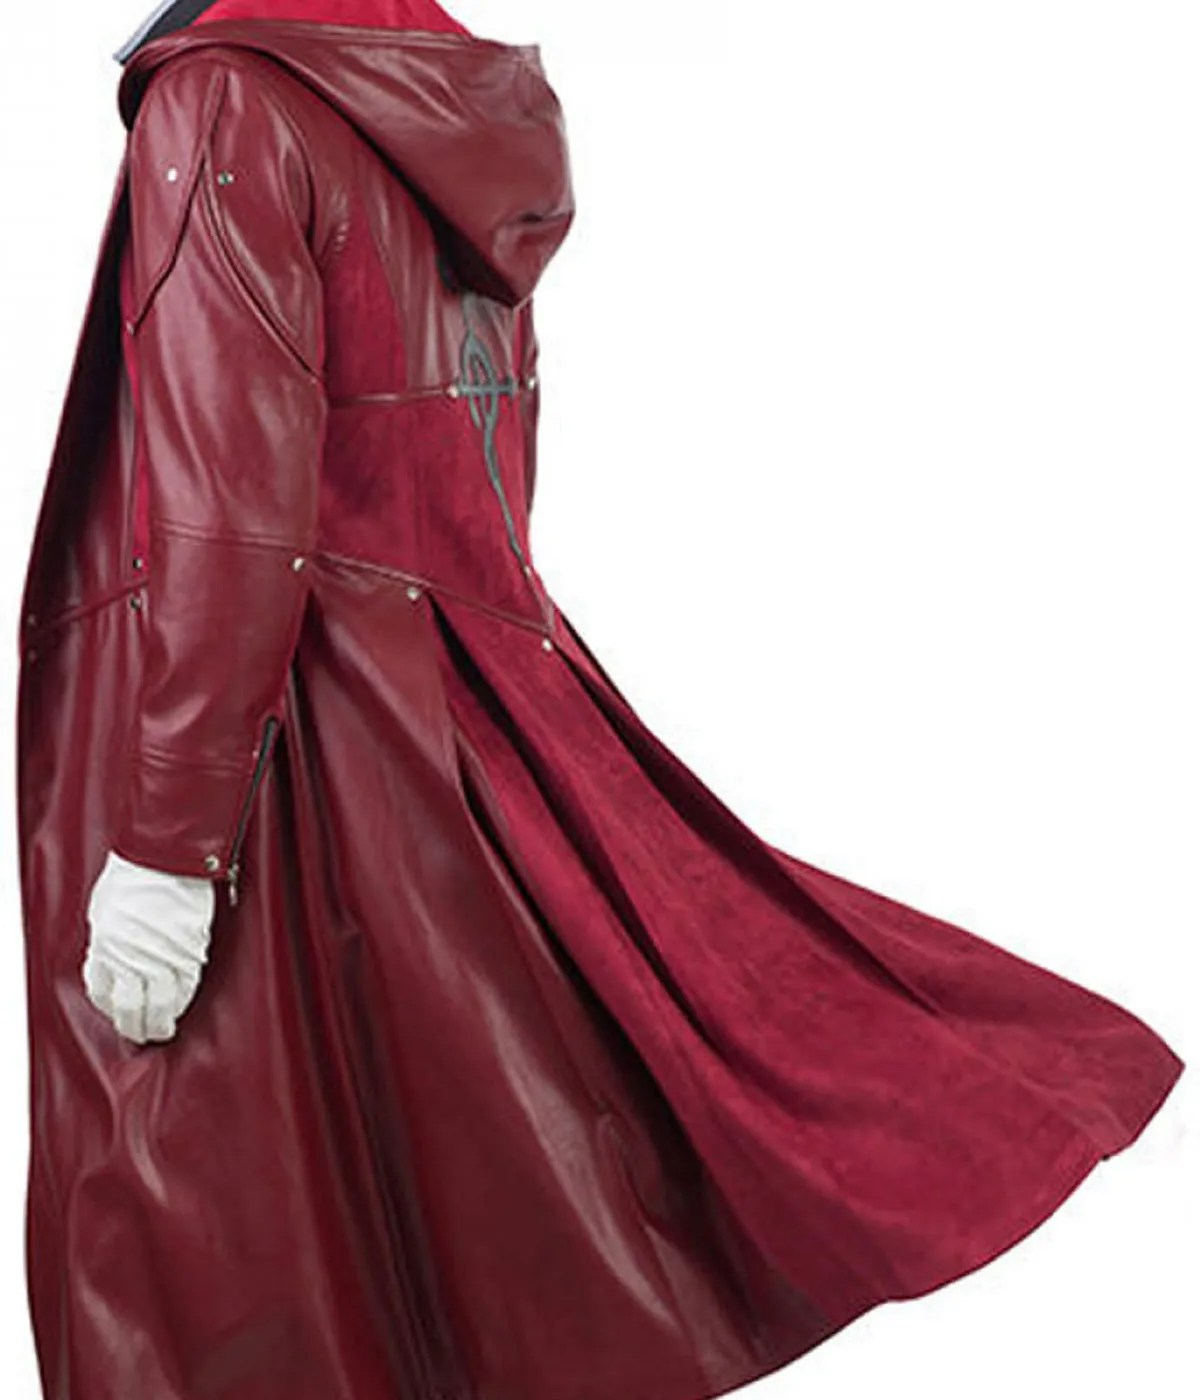 fullmetal-alchemist-edward-elric-coat